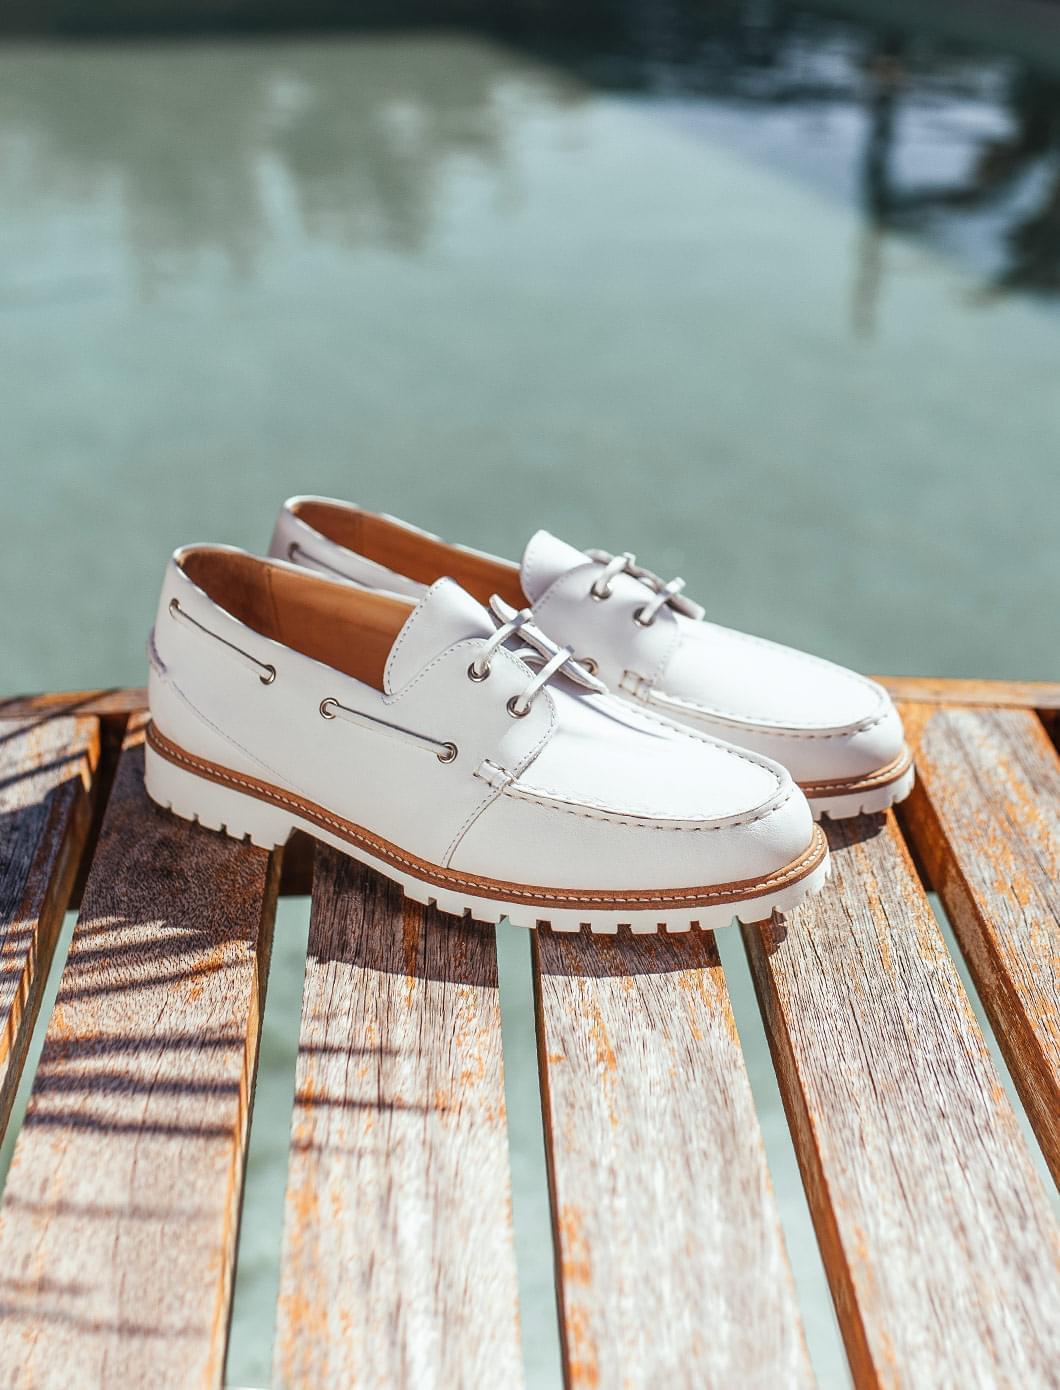 White Bateau shoes